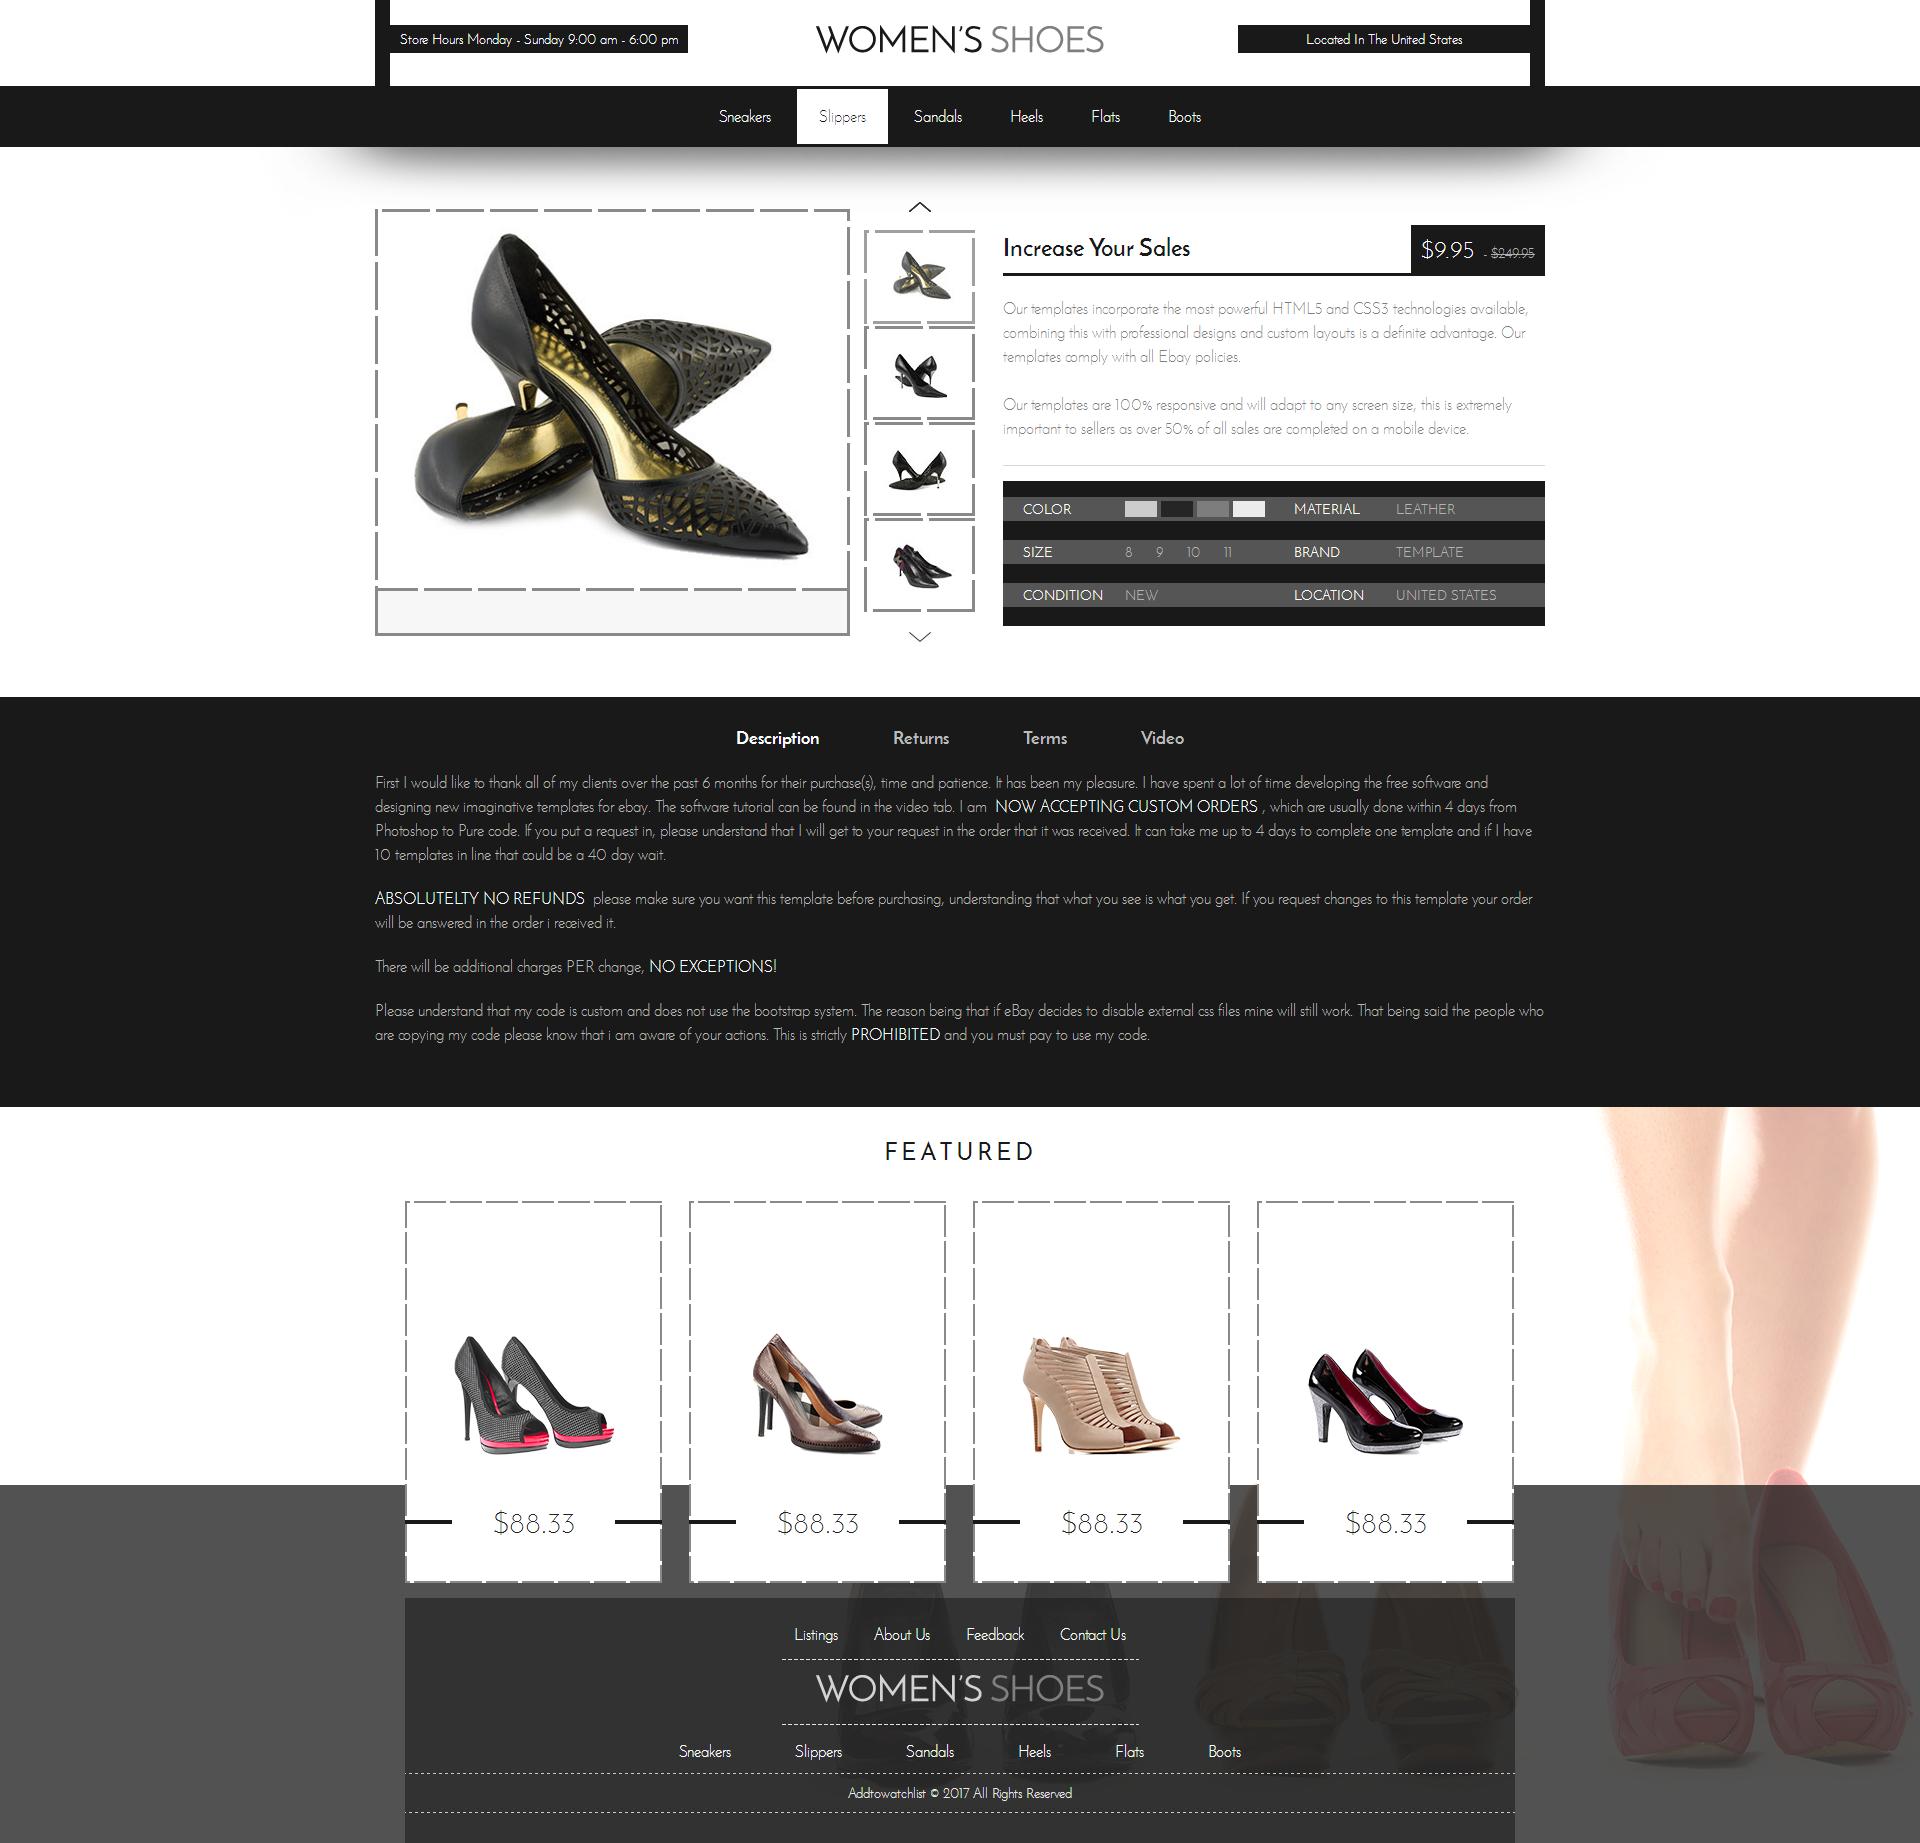 2020 Compliant Mobile Responsive Ebay Auction Listing Template Html Women Shoes Ebay Ebay Templates Templates Mobile Responsive